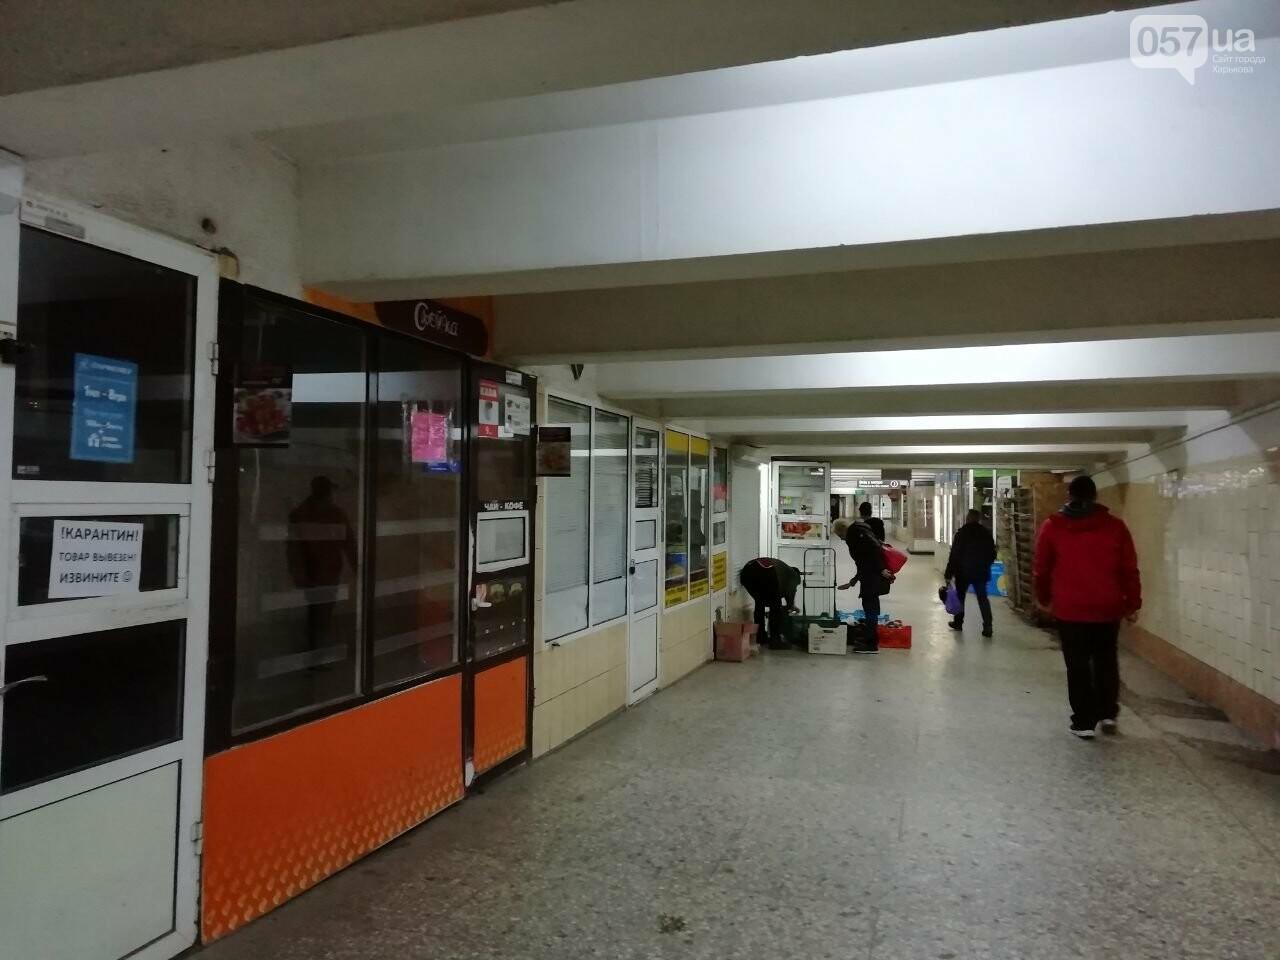 Безлюдный вокзал и дезинфекция трамваев: как живет ЮЖД во время карантина, - ФОТО, фото-6